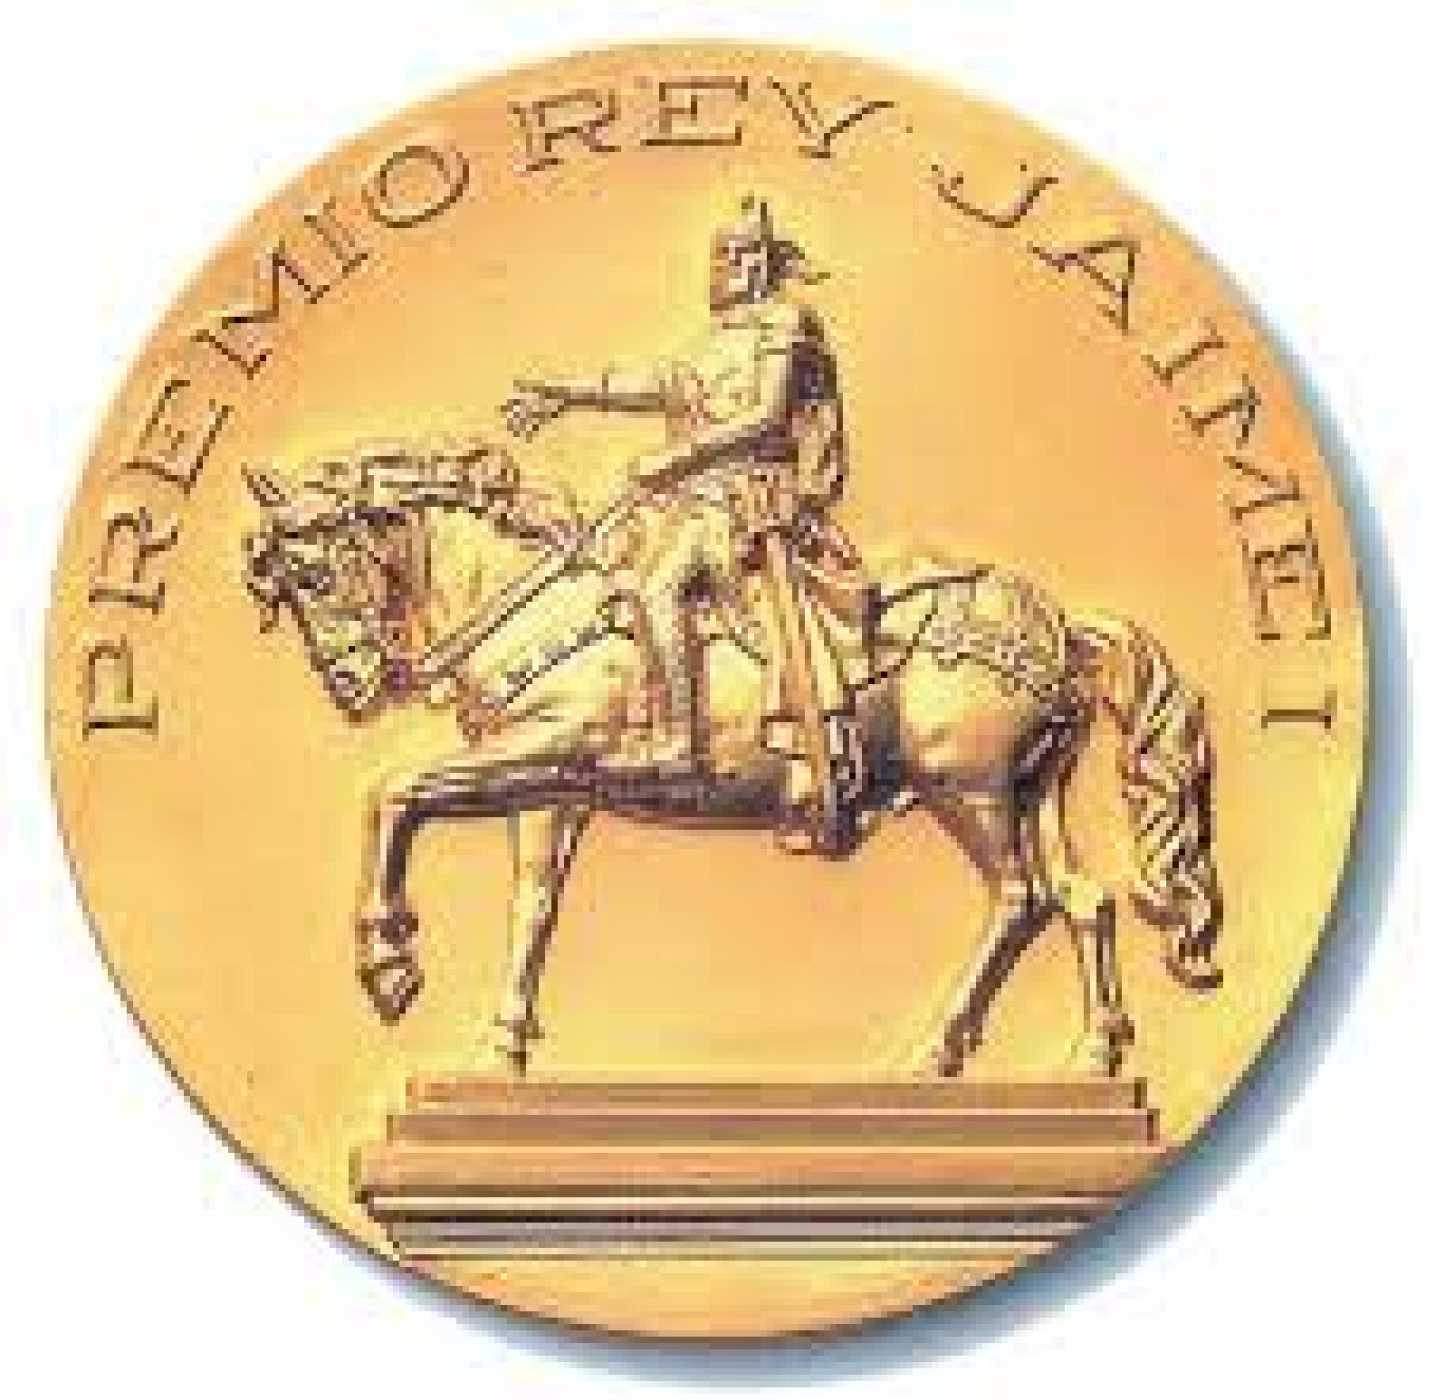 Crónica entrega premios Rey Jaime I - 30/11/20 - Escuchar ahora